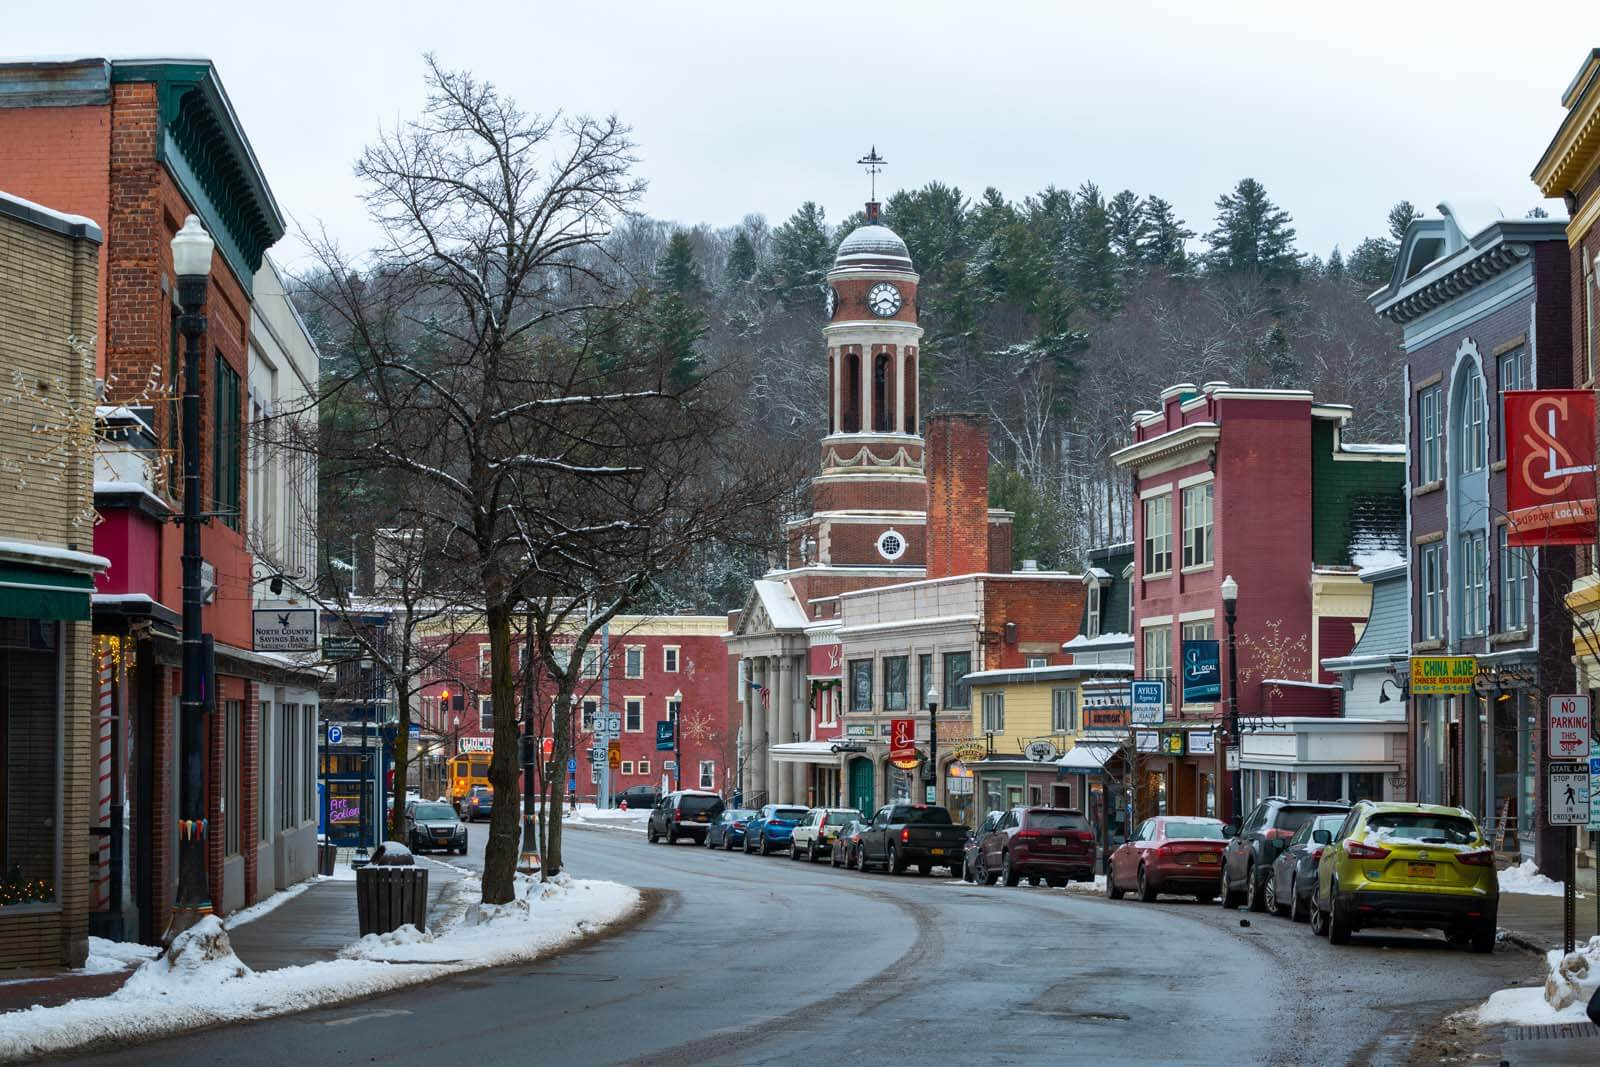 Downtown Saranac Lake in the Adirondacks New York